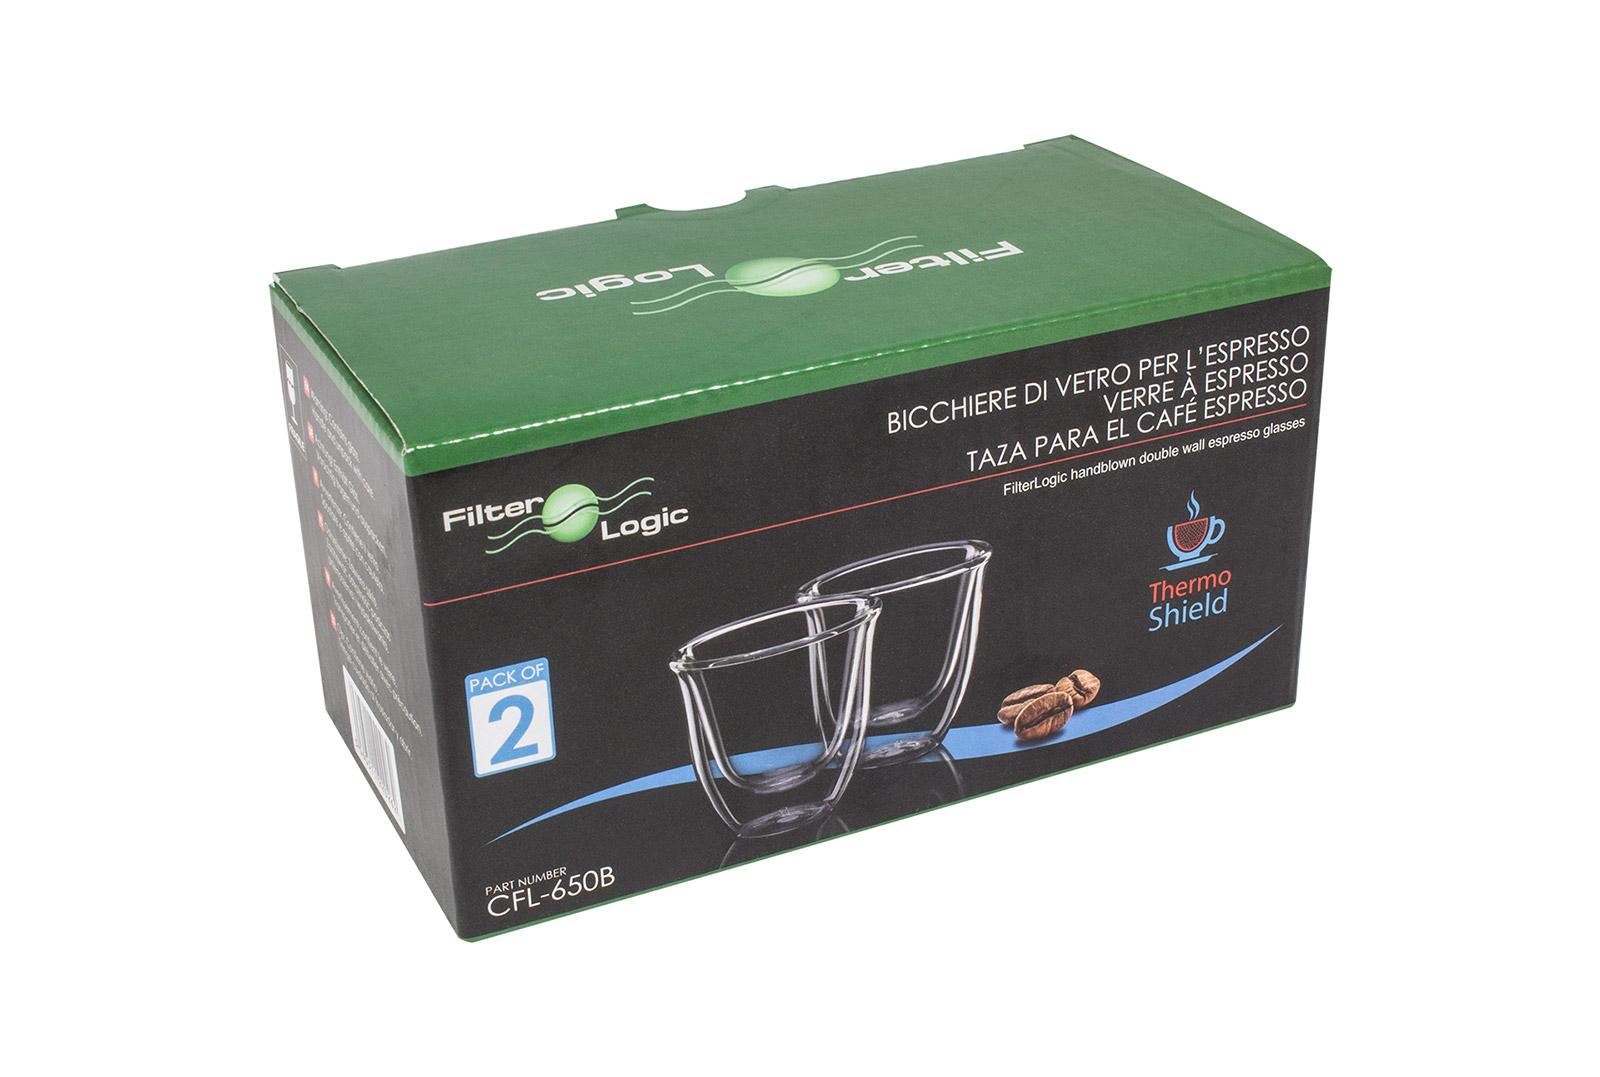 Цена Набор стаканов FilterLogic CFL-670 Cappuccino (2 шт) 300 ML